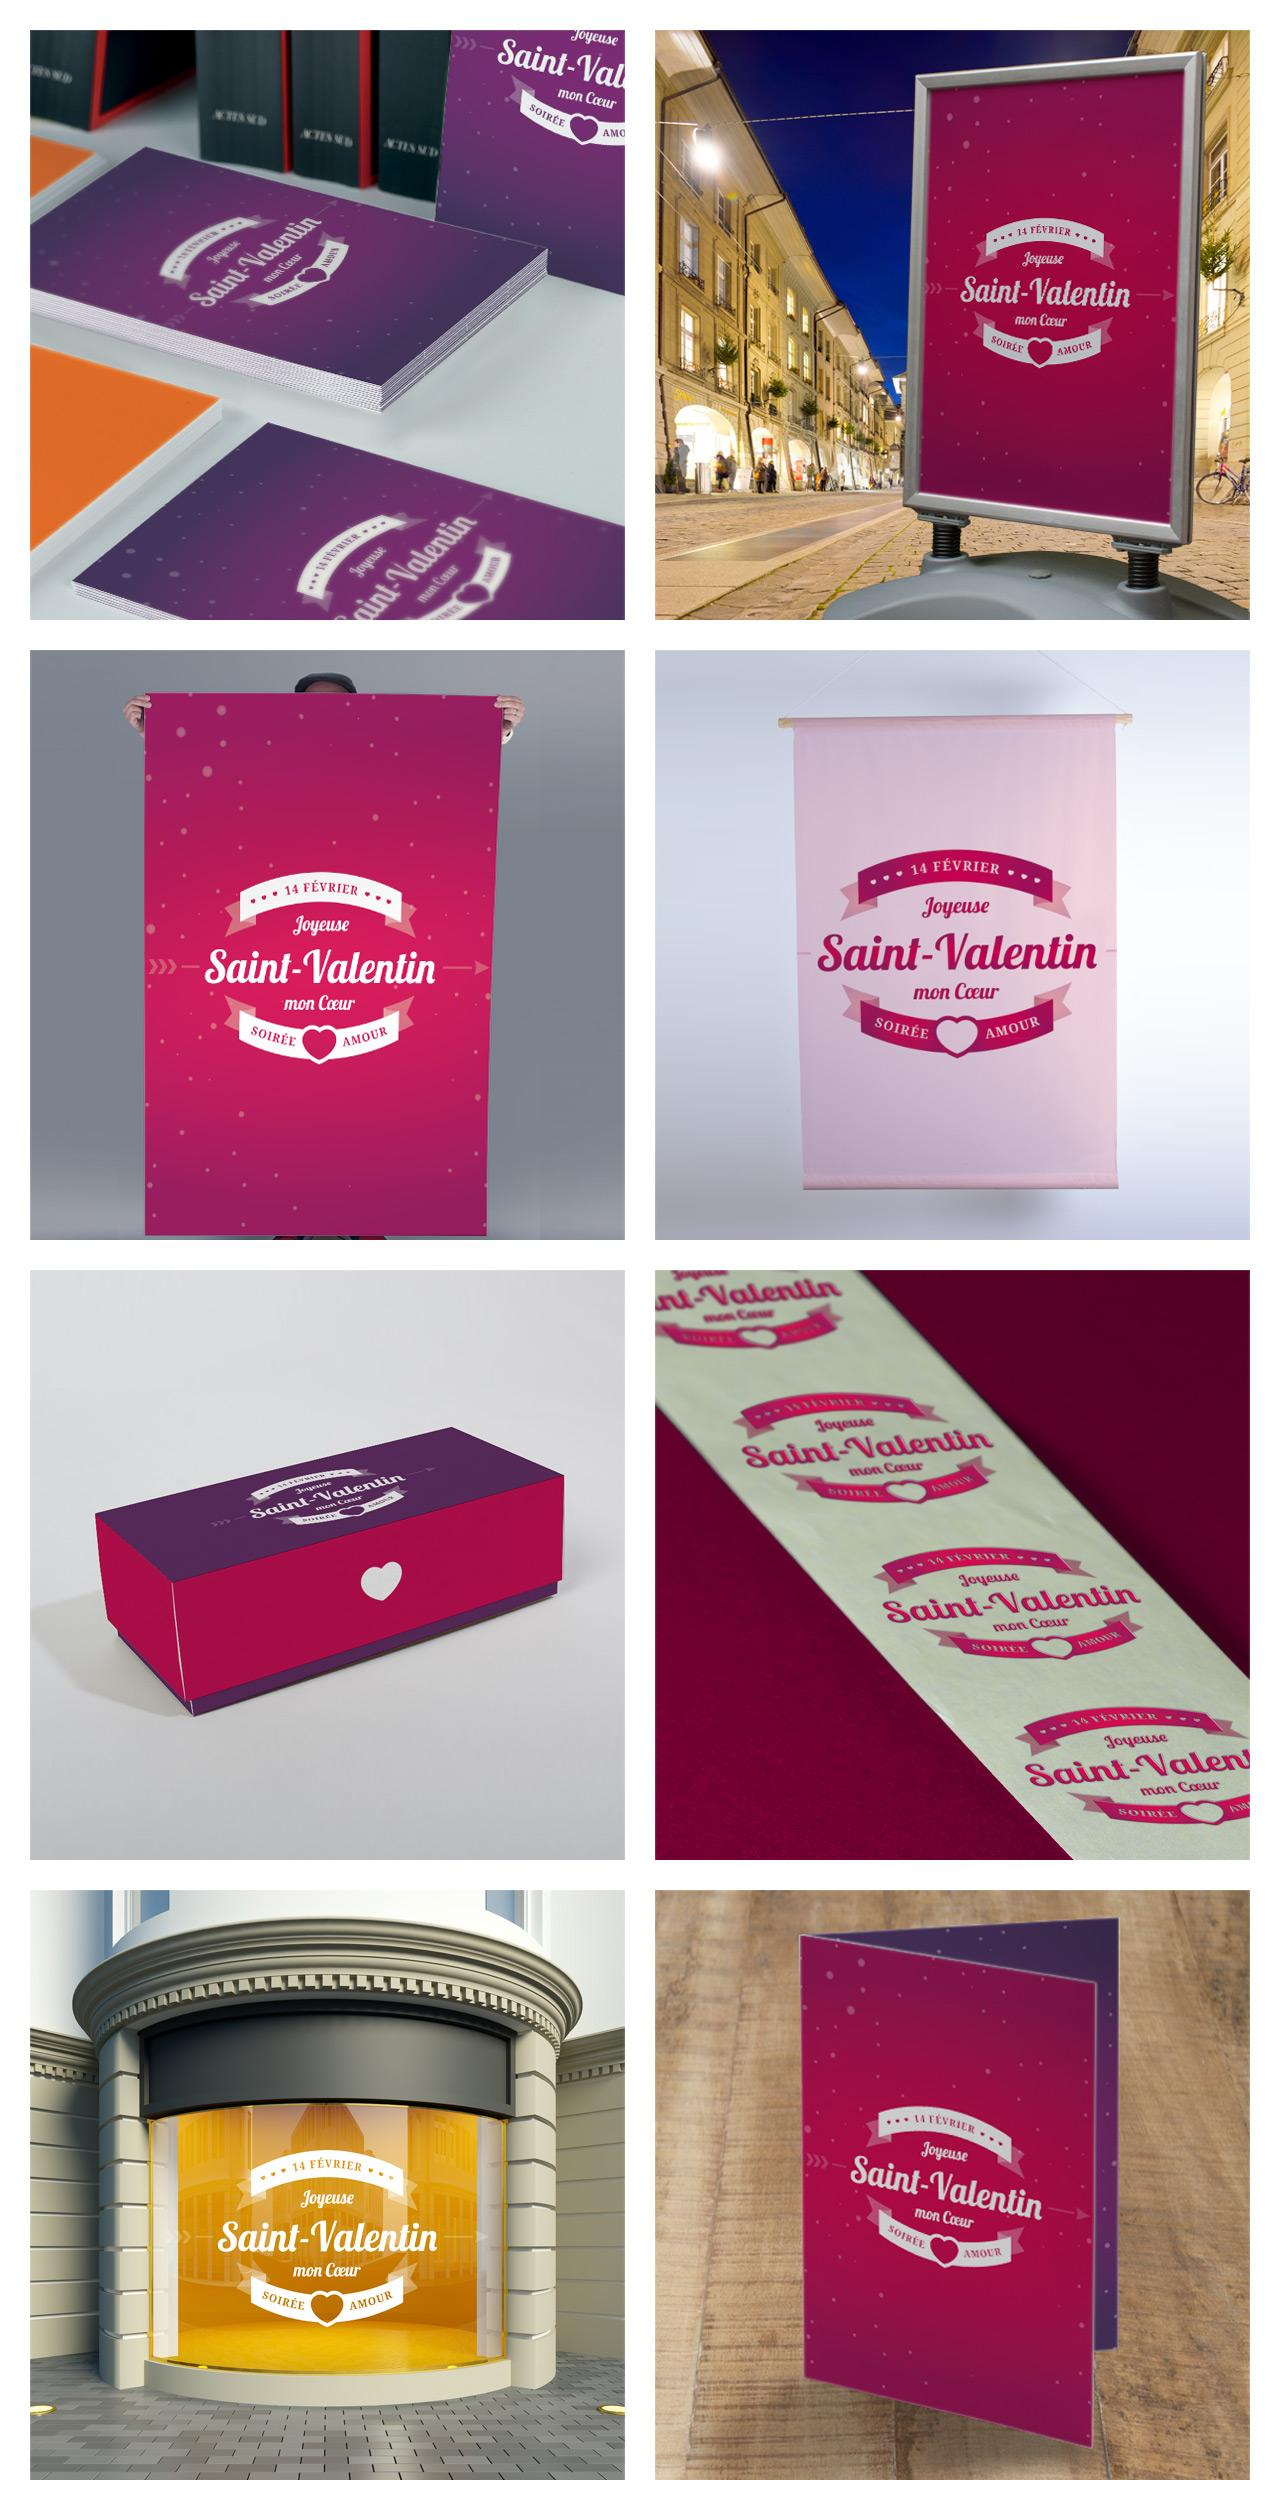 exaprint-saint-valentin-creation-depliant-flyer-affiche-kakemono-etiquette-packaging-caconcept-alexis-cretin-graphiste-montpellier